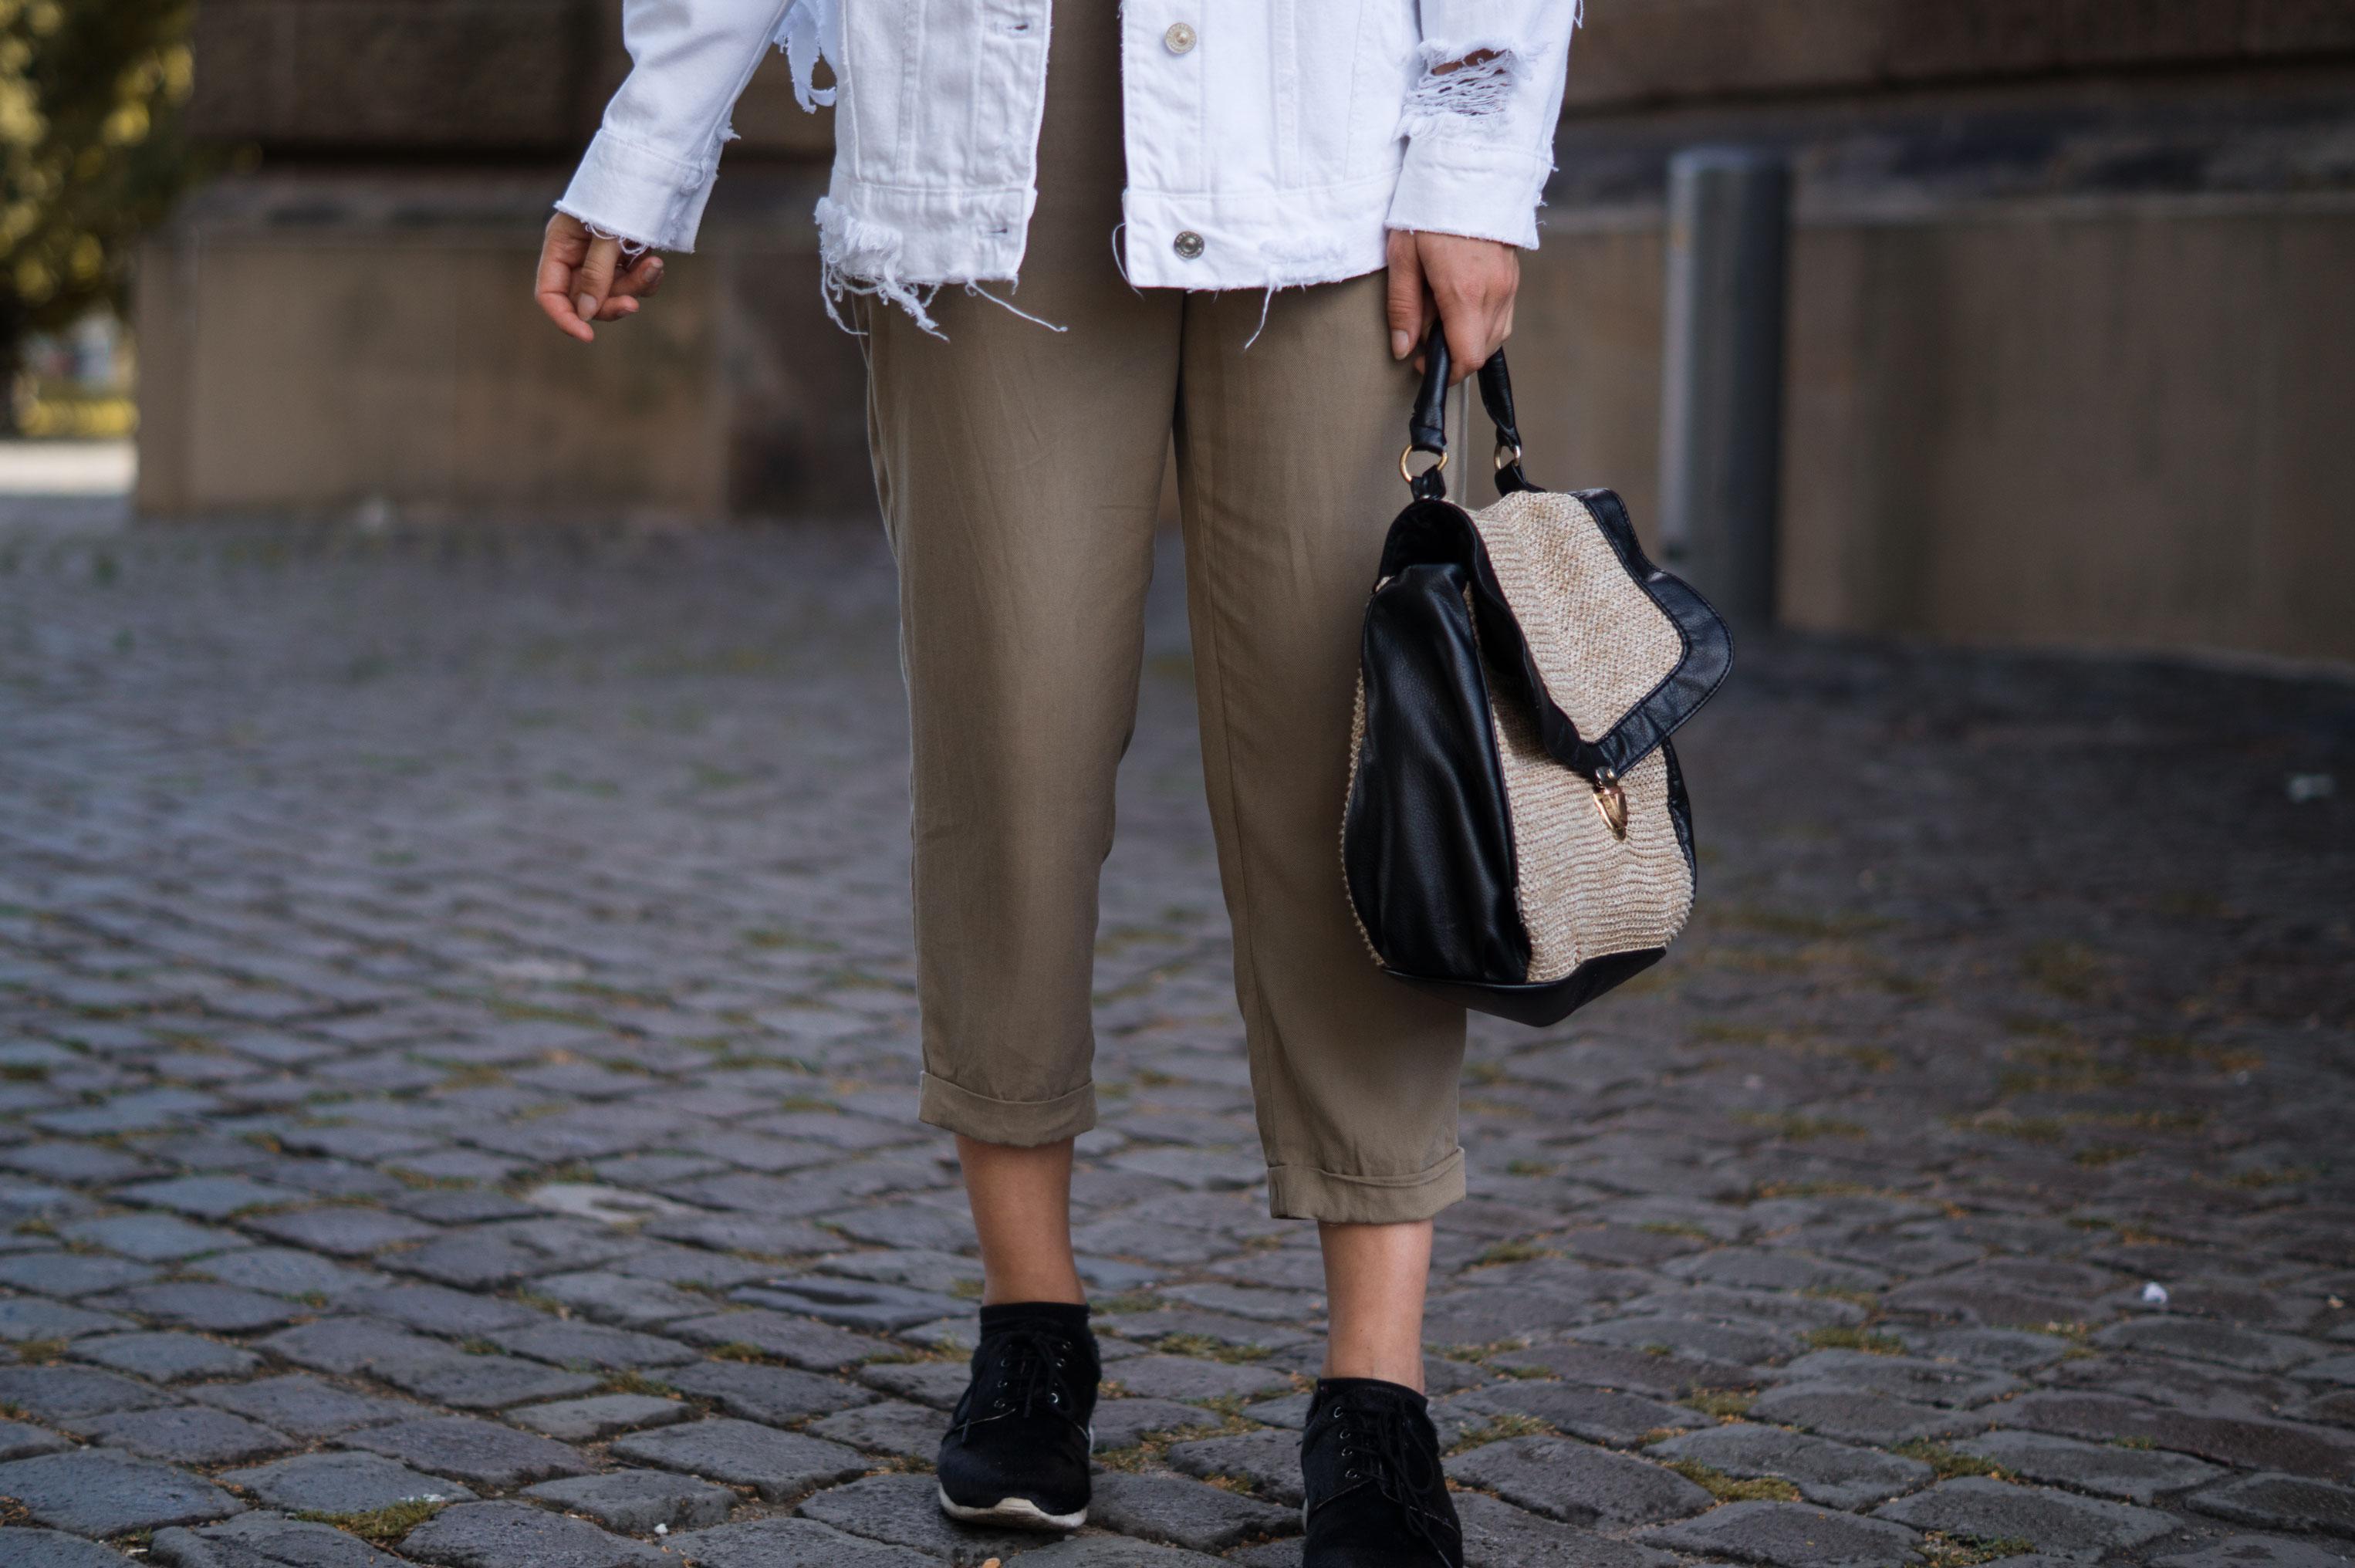 Fringed Denim Jacket Fransenjacke weiße Jeansjacke Casual Outfit Sariety Fashionblogger Modeblog Heidelberg Mannheim Wasserturm-5